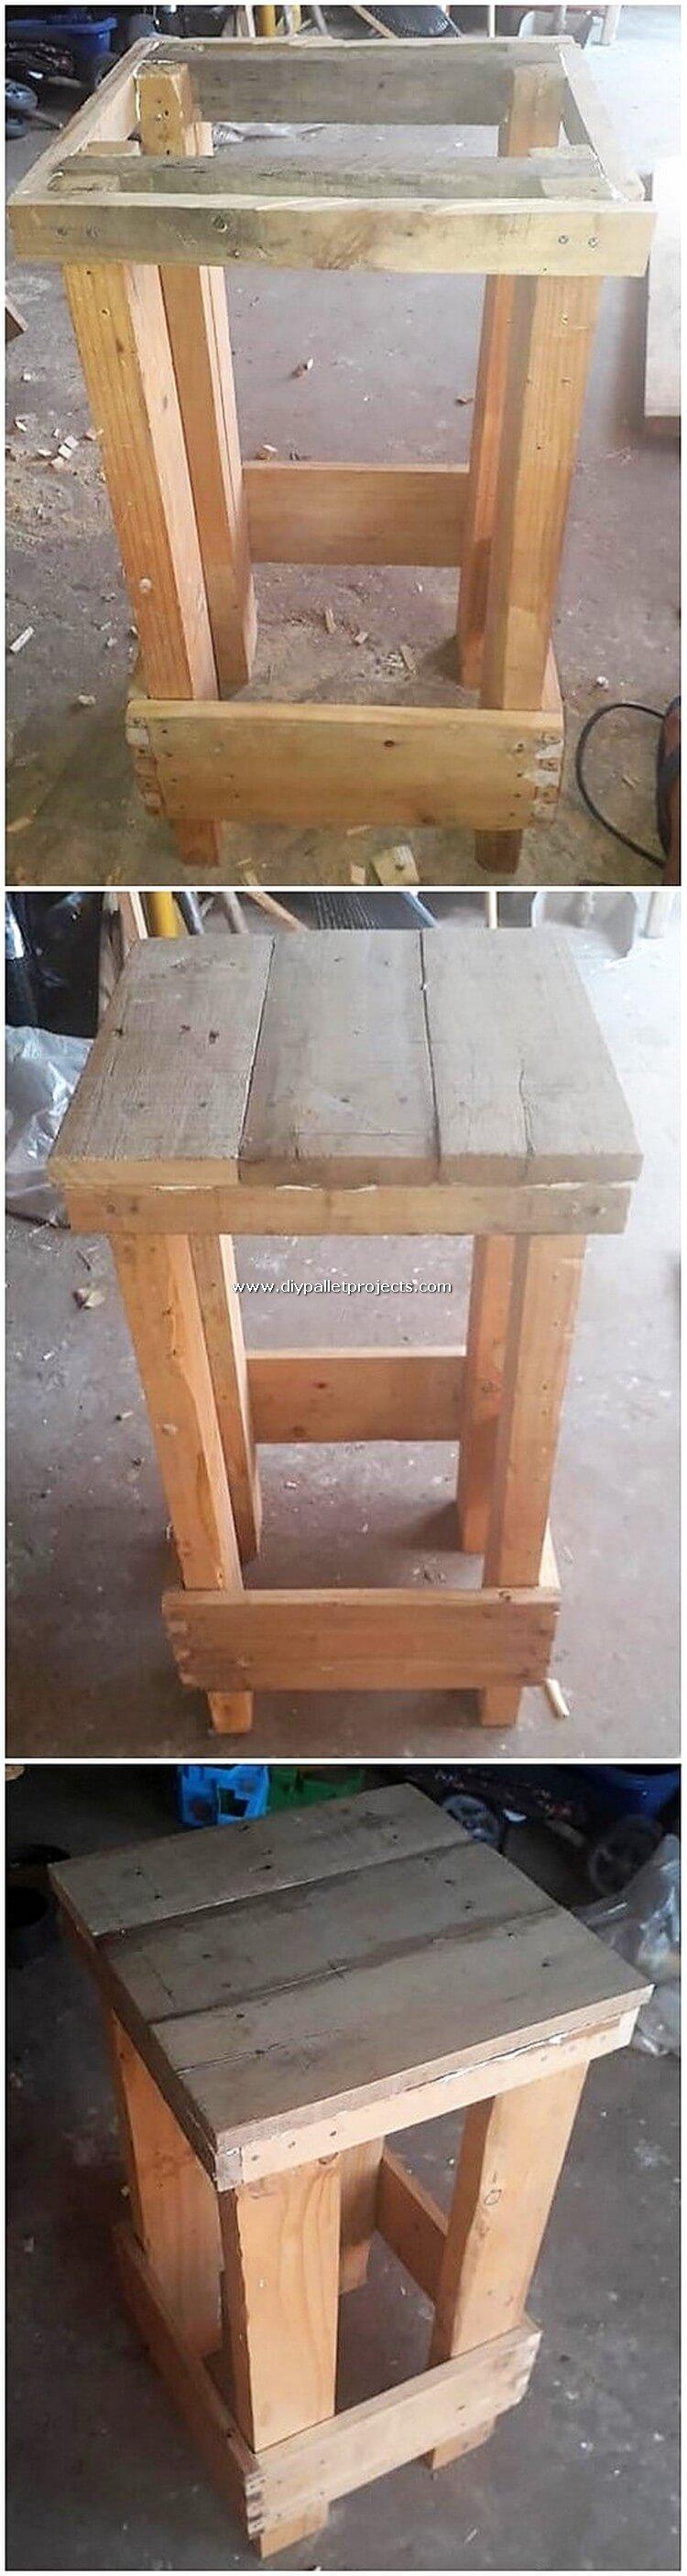 DIY Pallet Stool